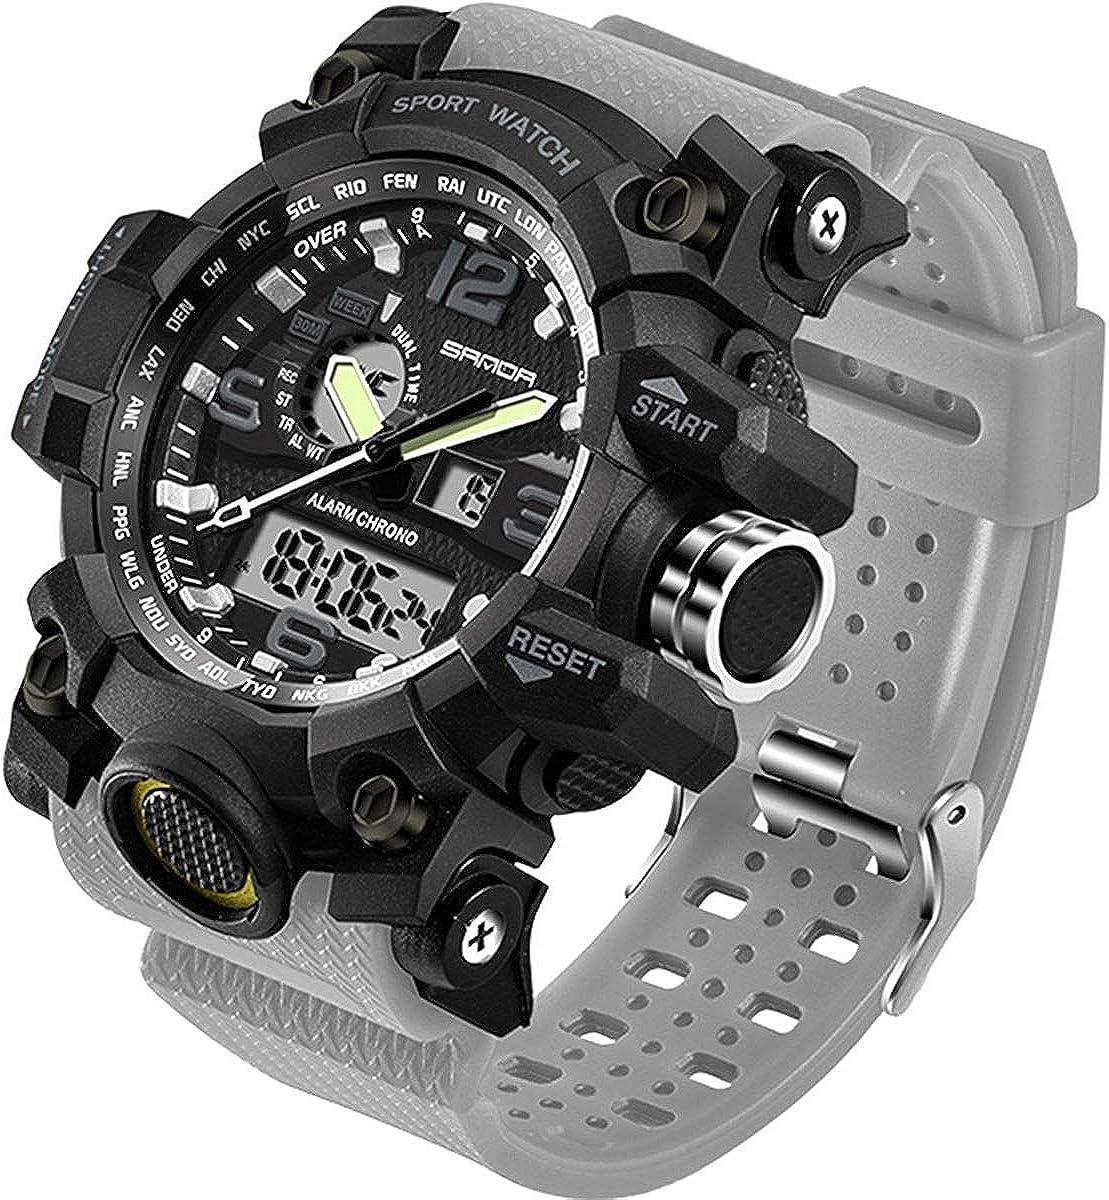 Men's Watch Military Waterproof Sports Digital Watch Big Wrist for Men Dual-Display Army Tactical Wristwatch